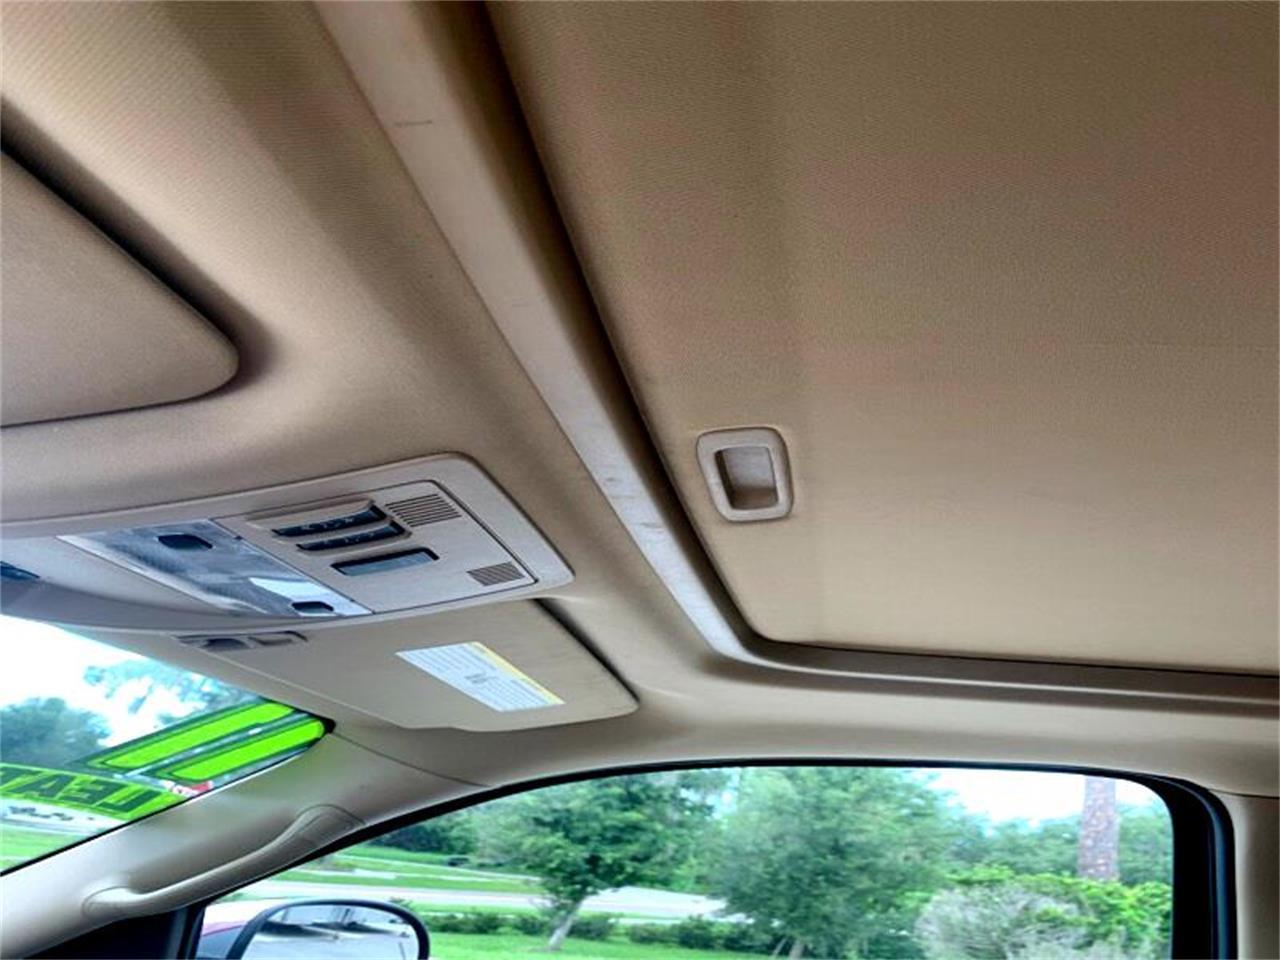 2011 Chevrolet Tahoe (CC-1391148) for sale in Tavares, Florida